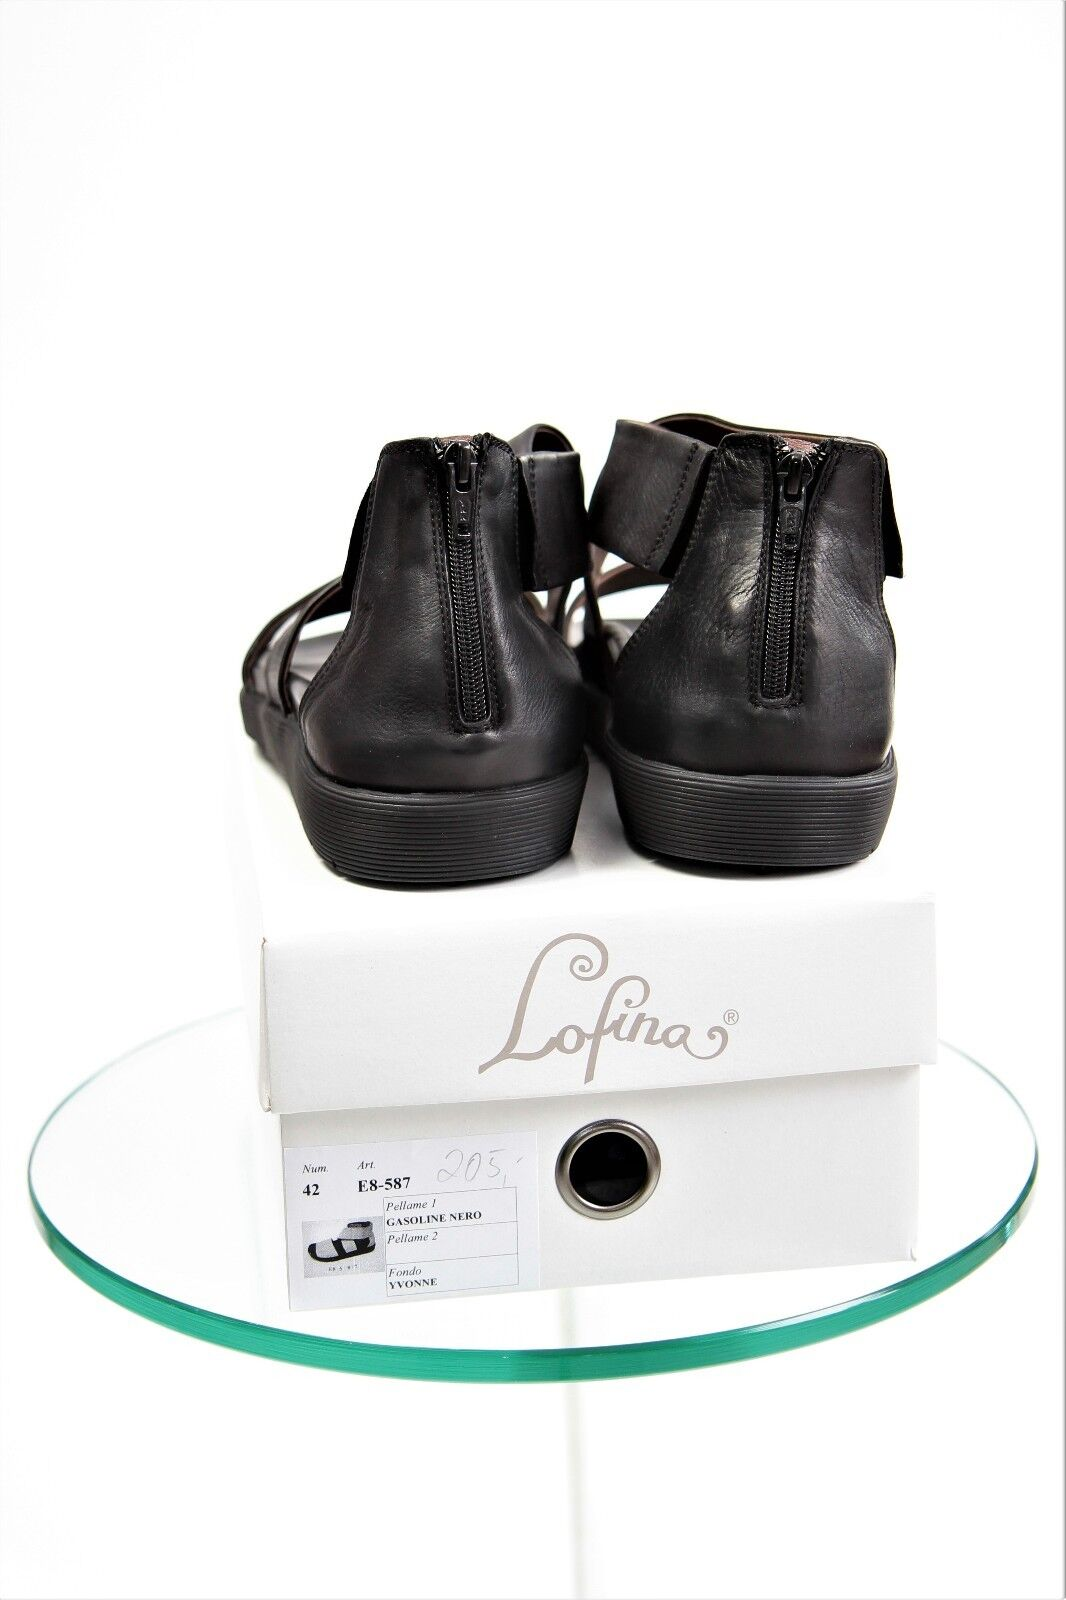 Lofina Damenschuhe Sandale Gr. 42/UK 8,0 US 10,5 Lagenlook, schwarz